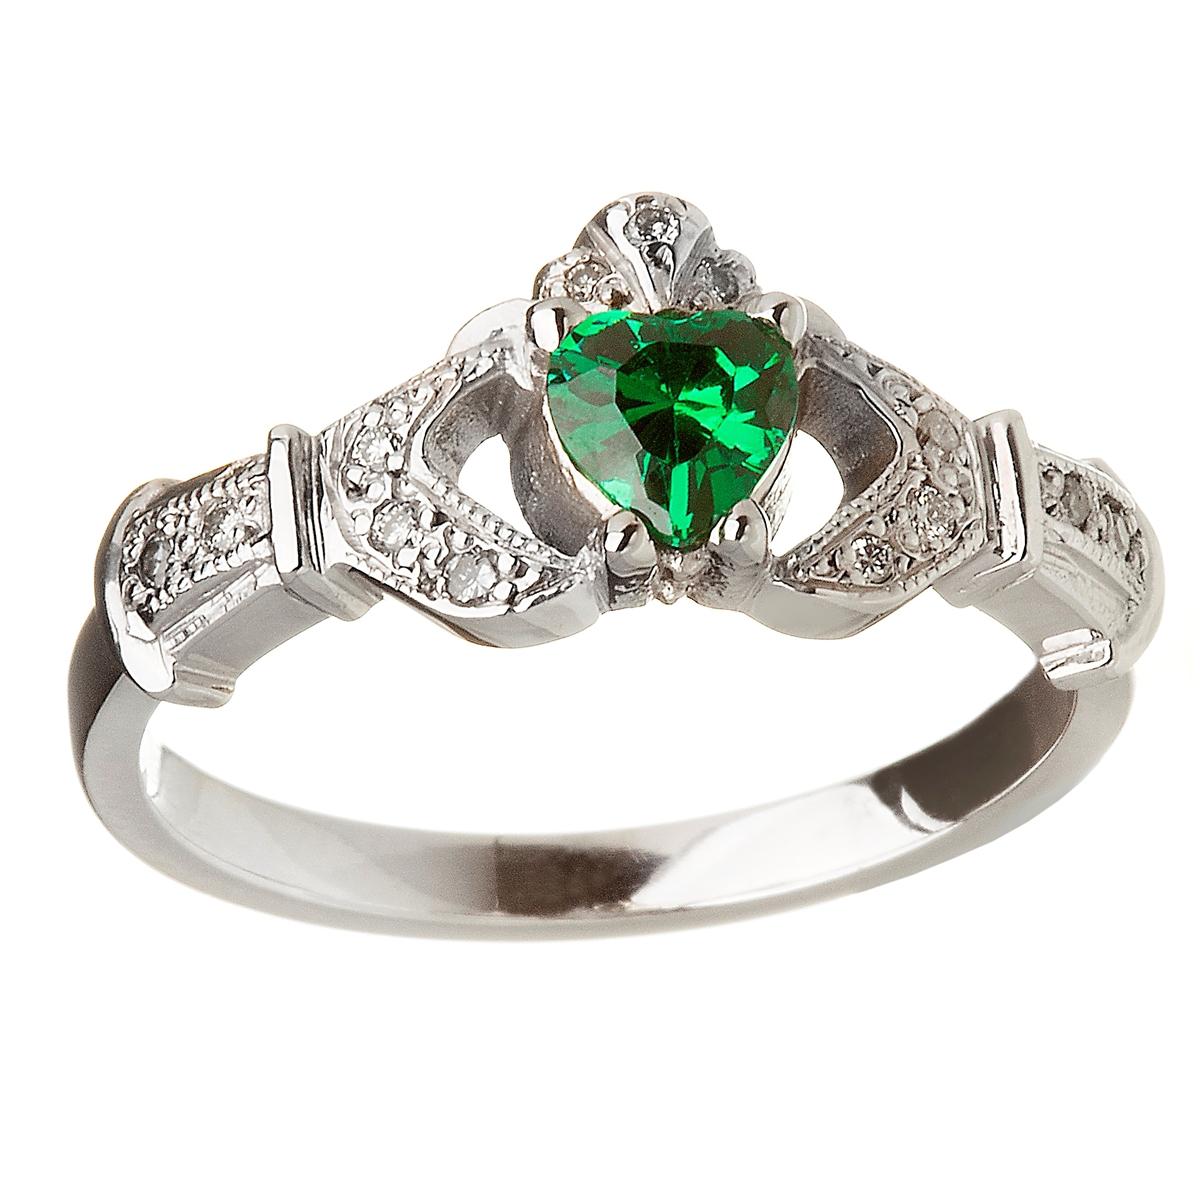 6b1b1b05e530c 14k White Gold Emerald Set Heart Claddagh Ring 12.4mm